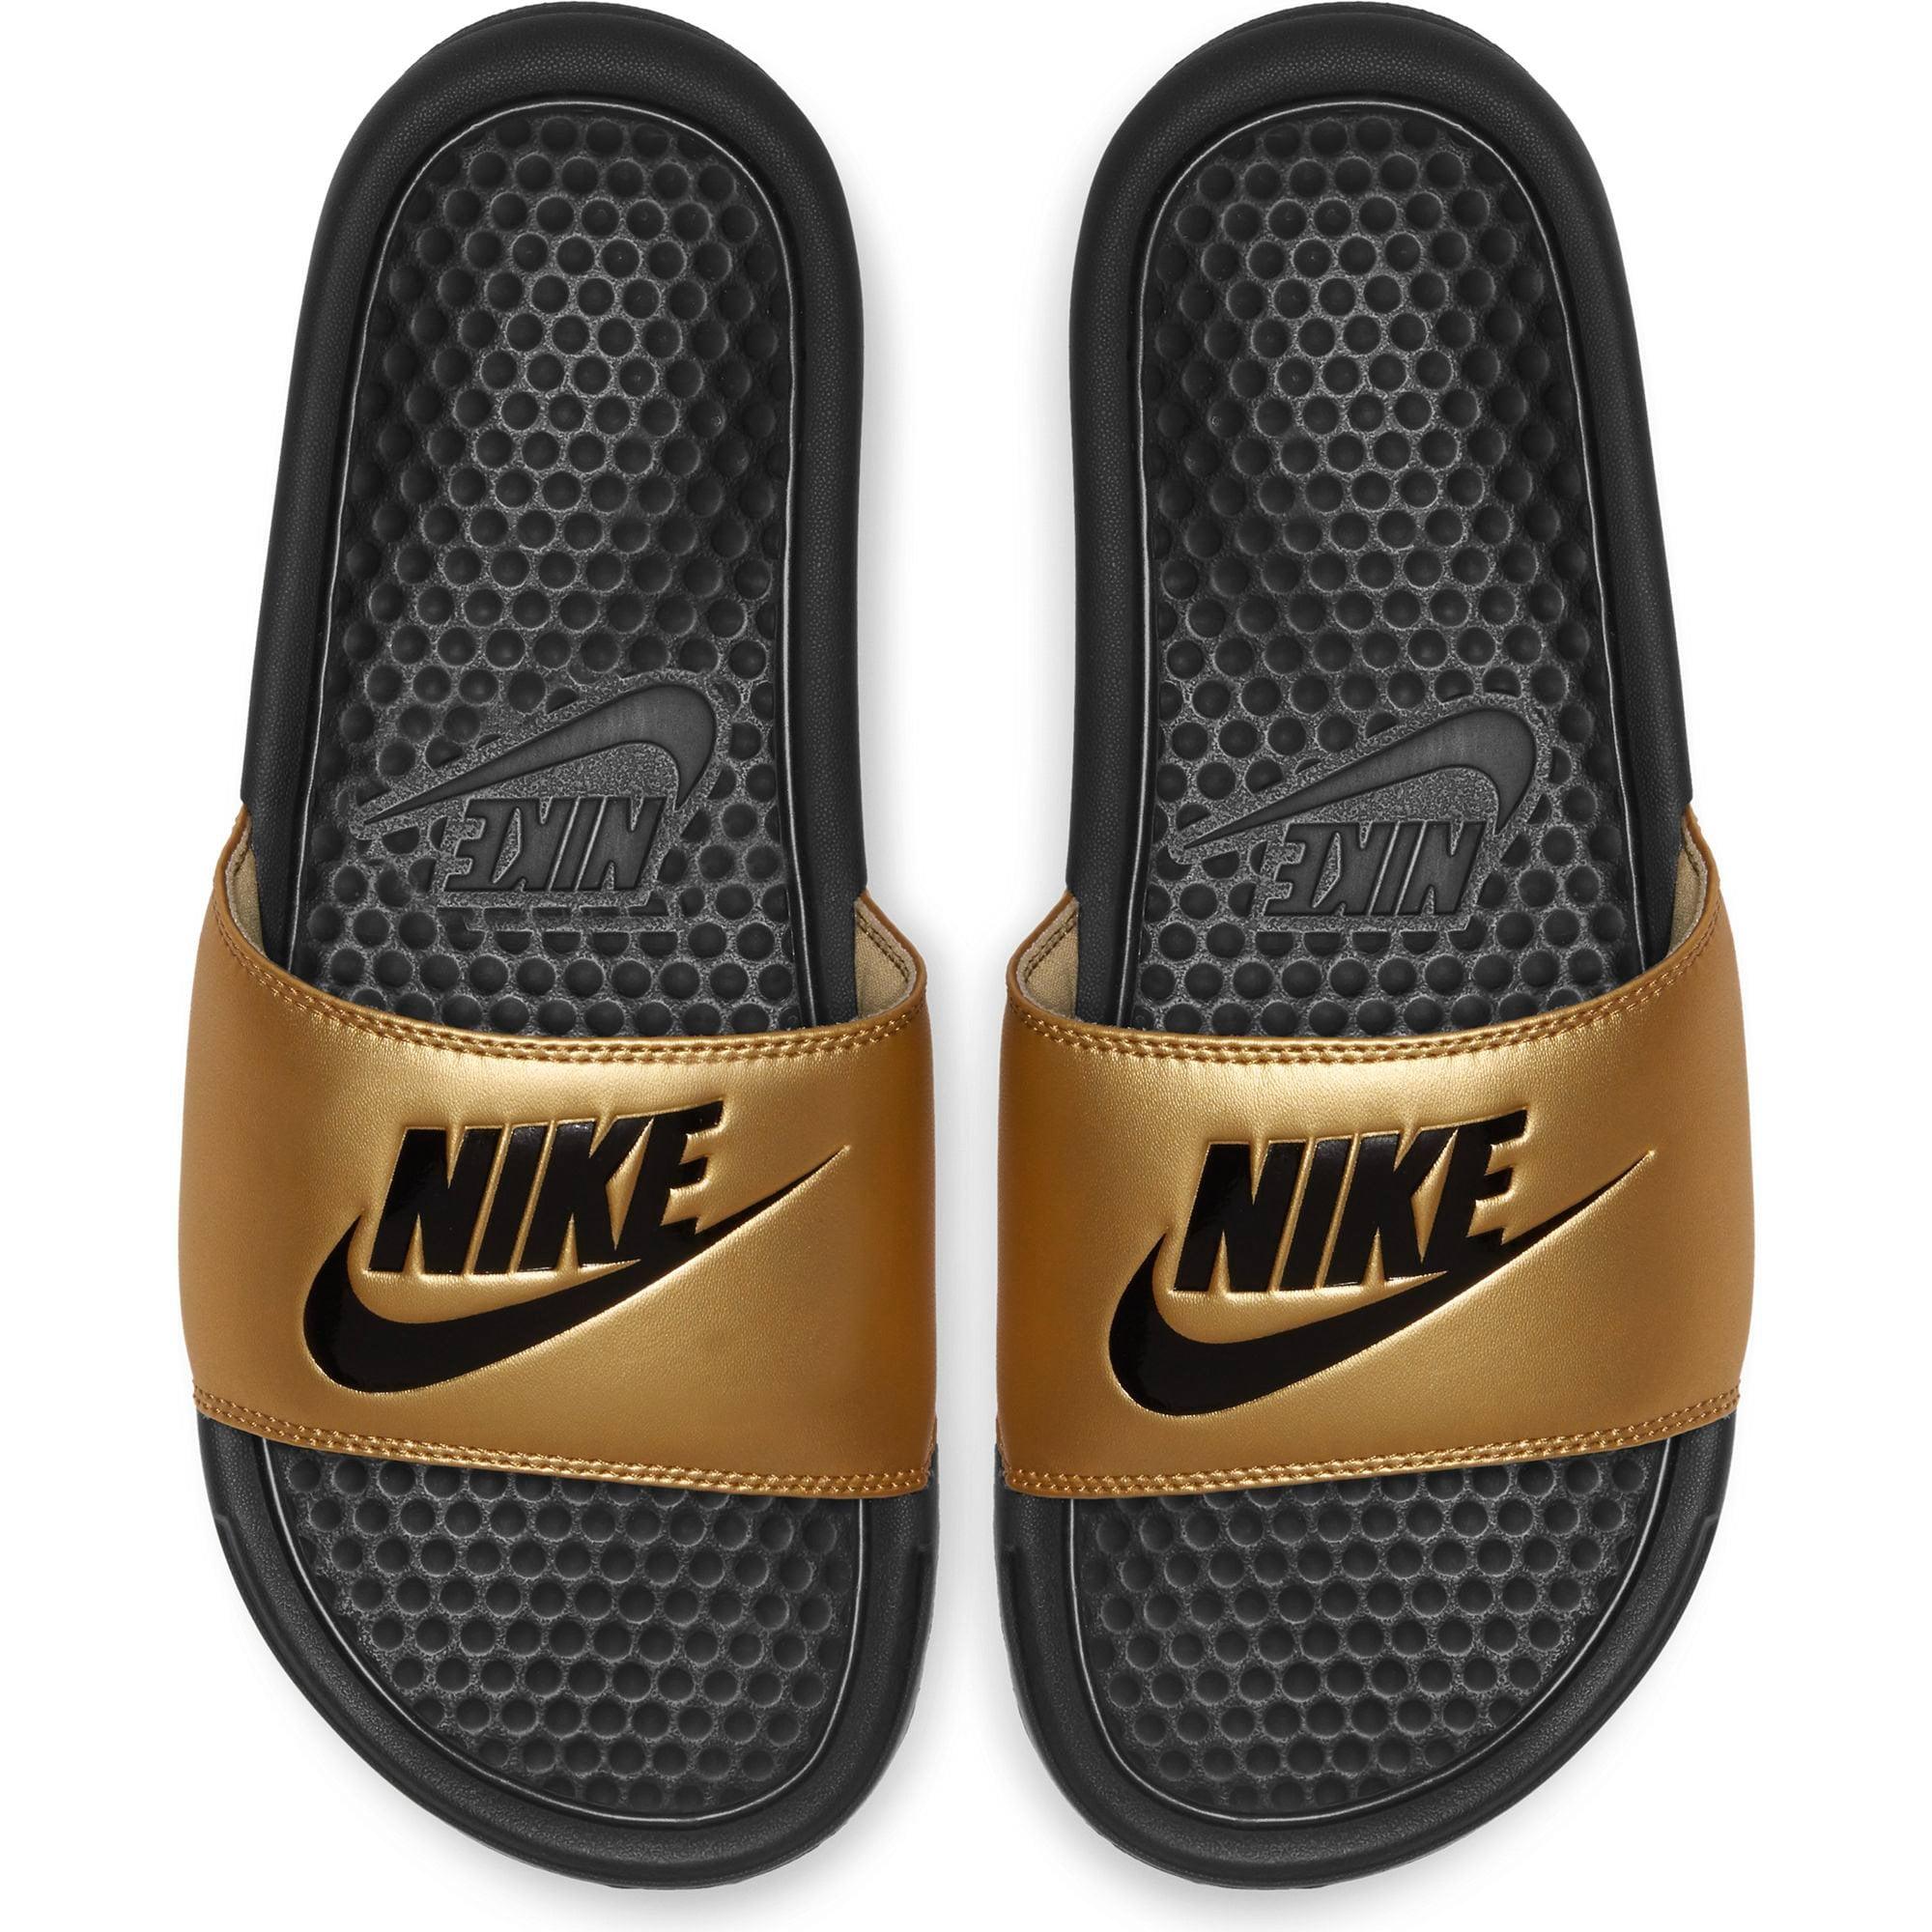 NIKE Nike Womens Benassi Sliders (Black